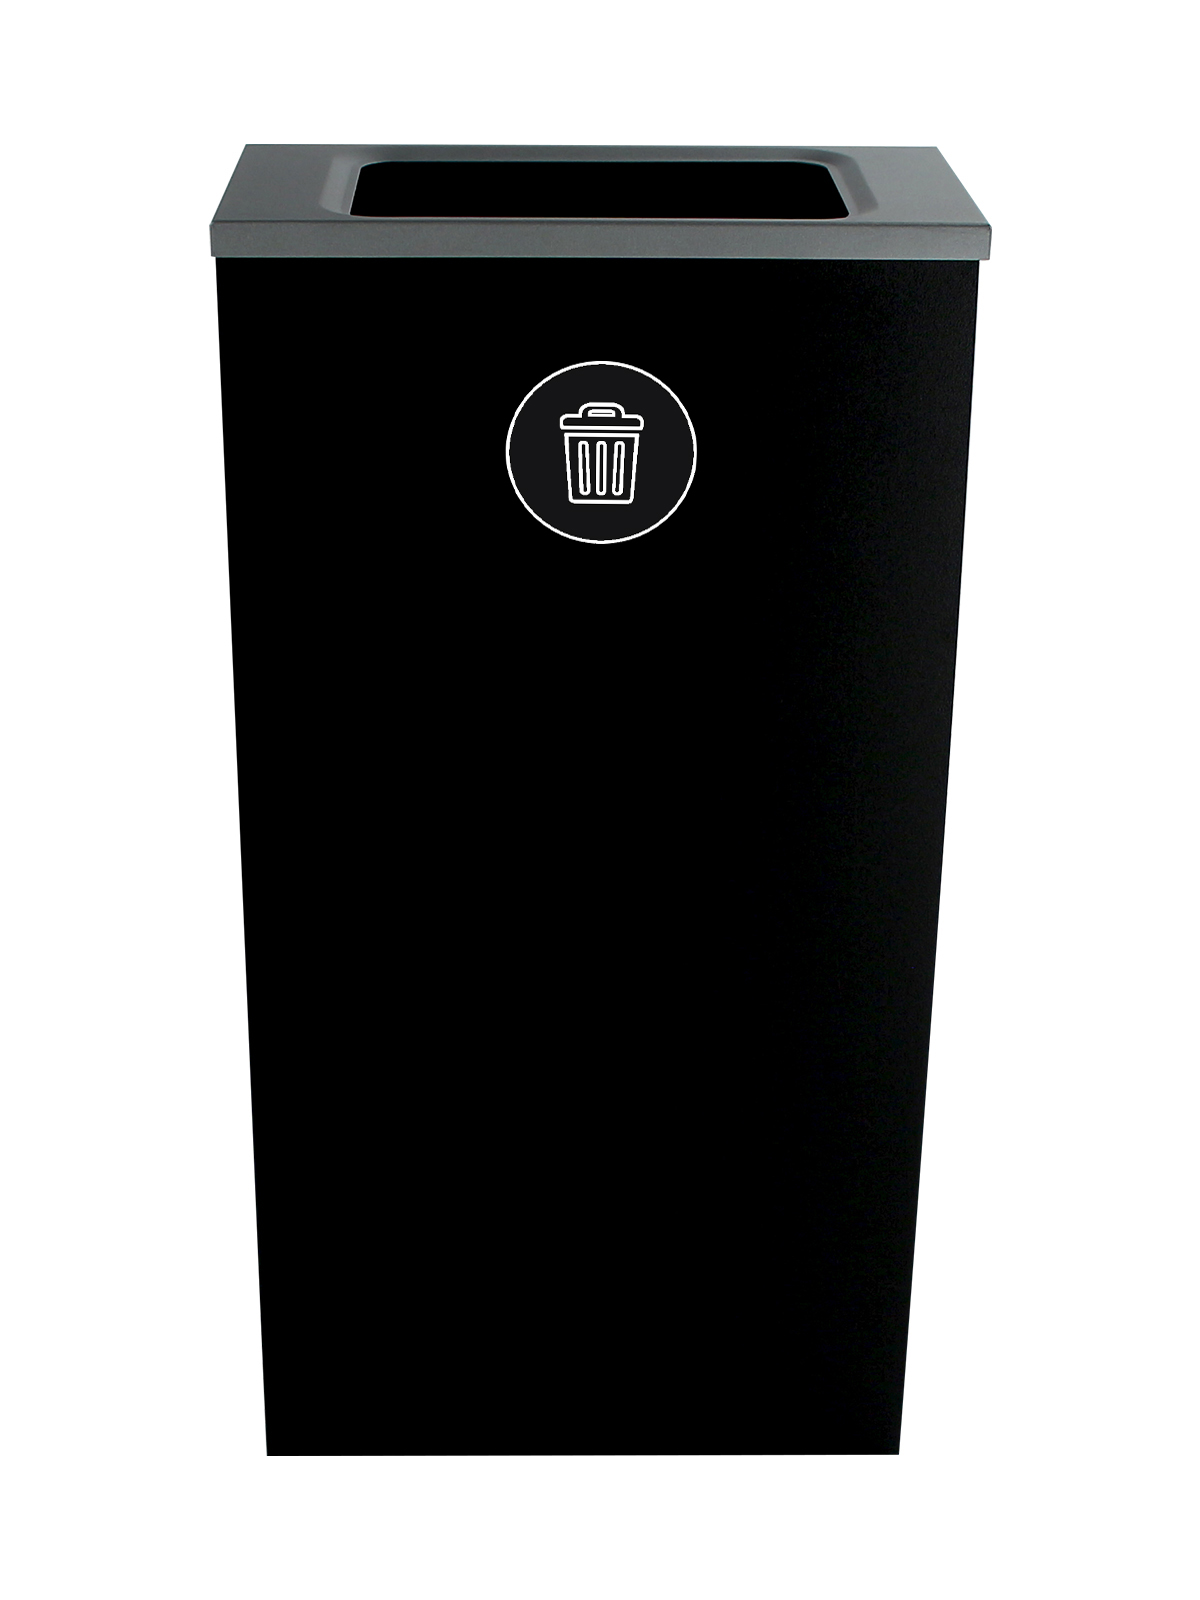 SPECTRUM - Single - Cube Slim - Waste - Full - Black